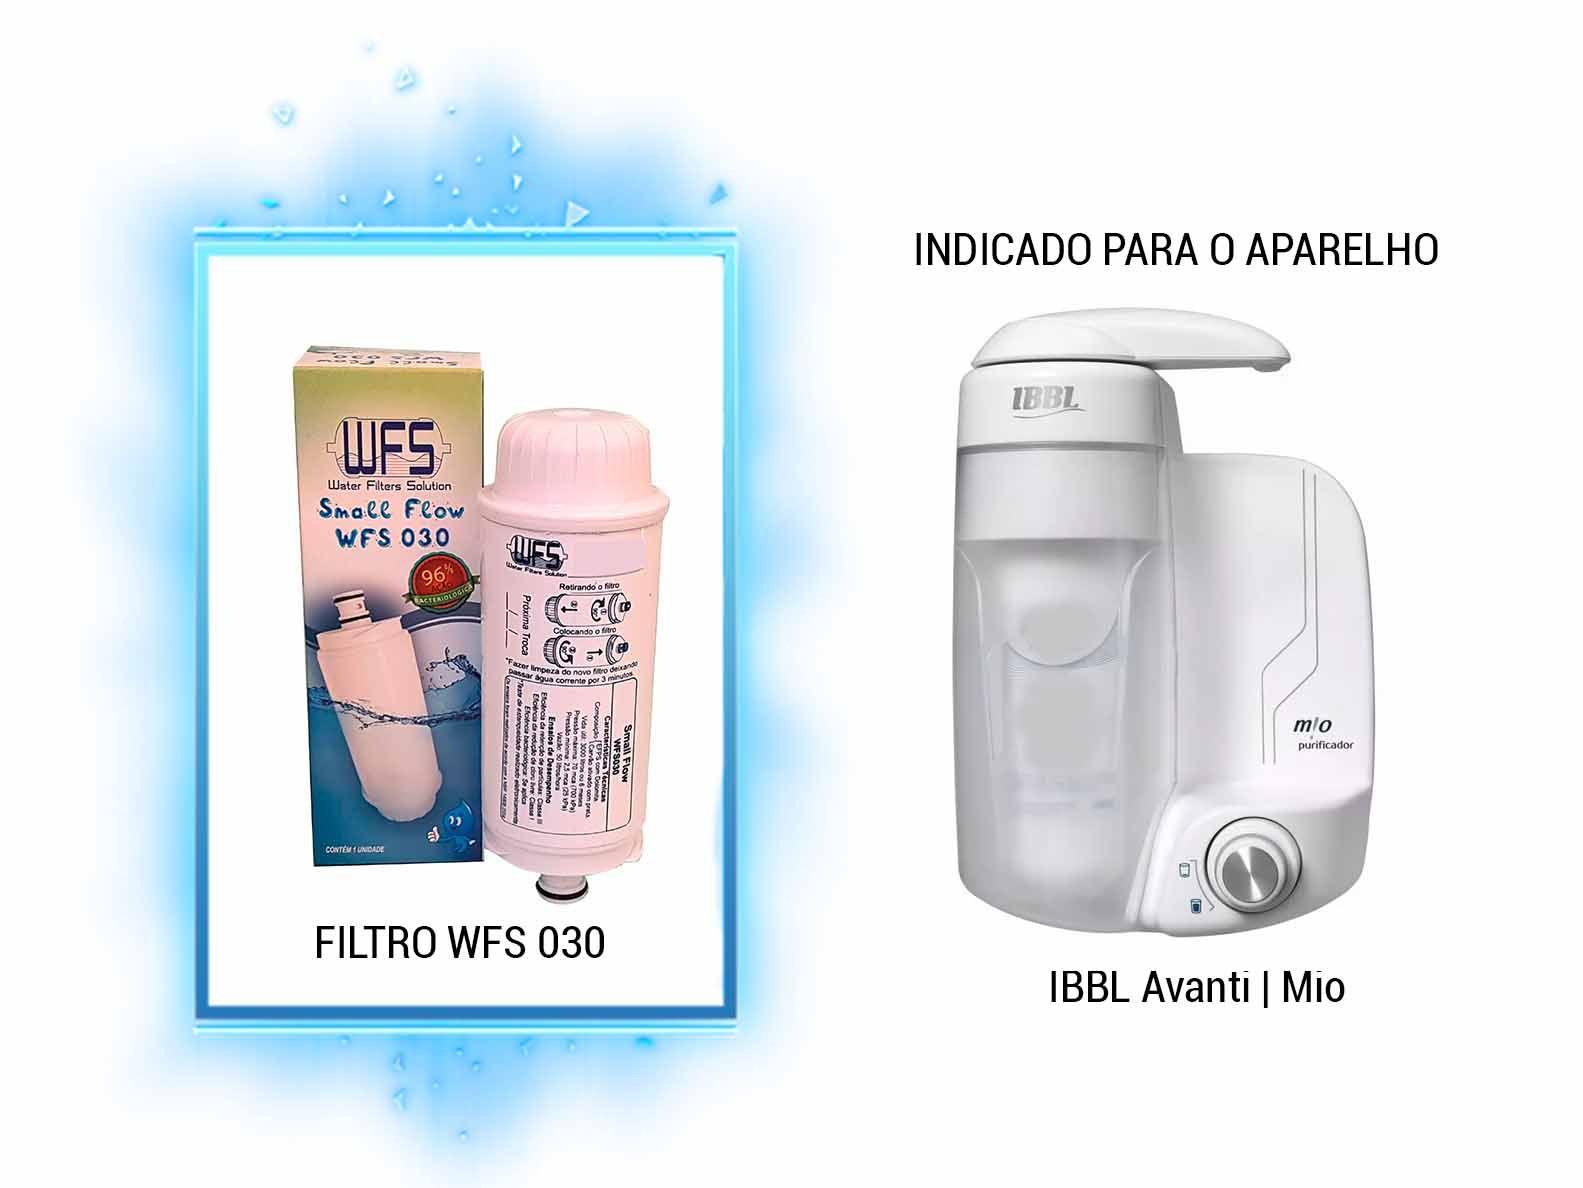 Refil Purificador IBBL / AVANT / MIO | Wfs 030 | Small Flow